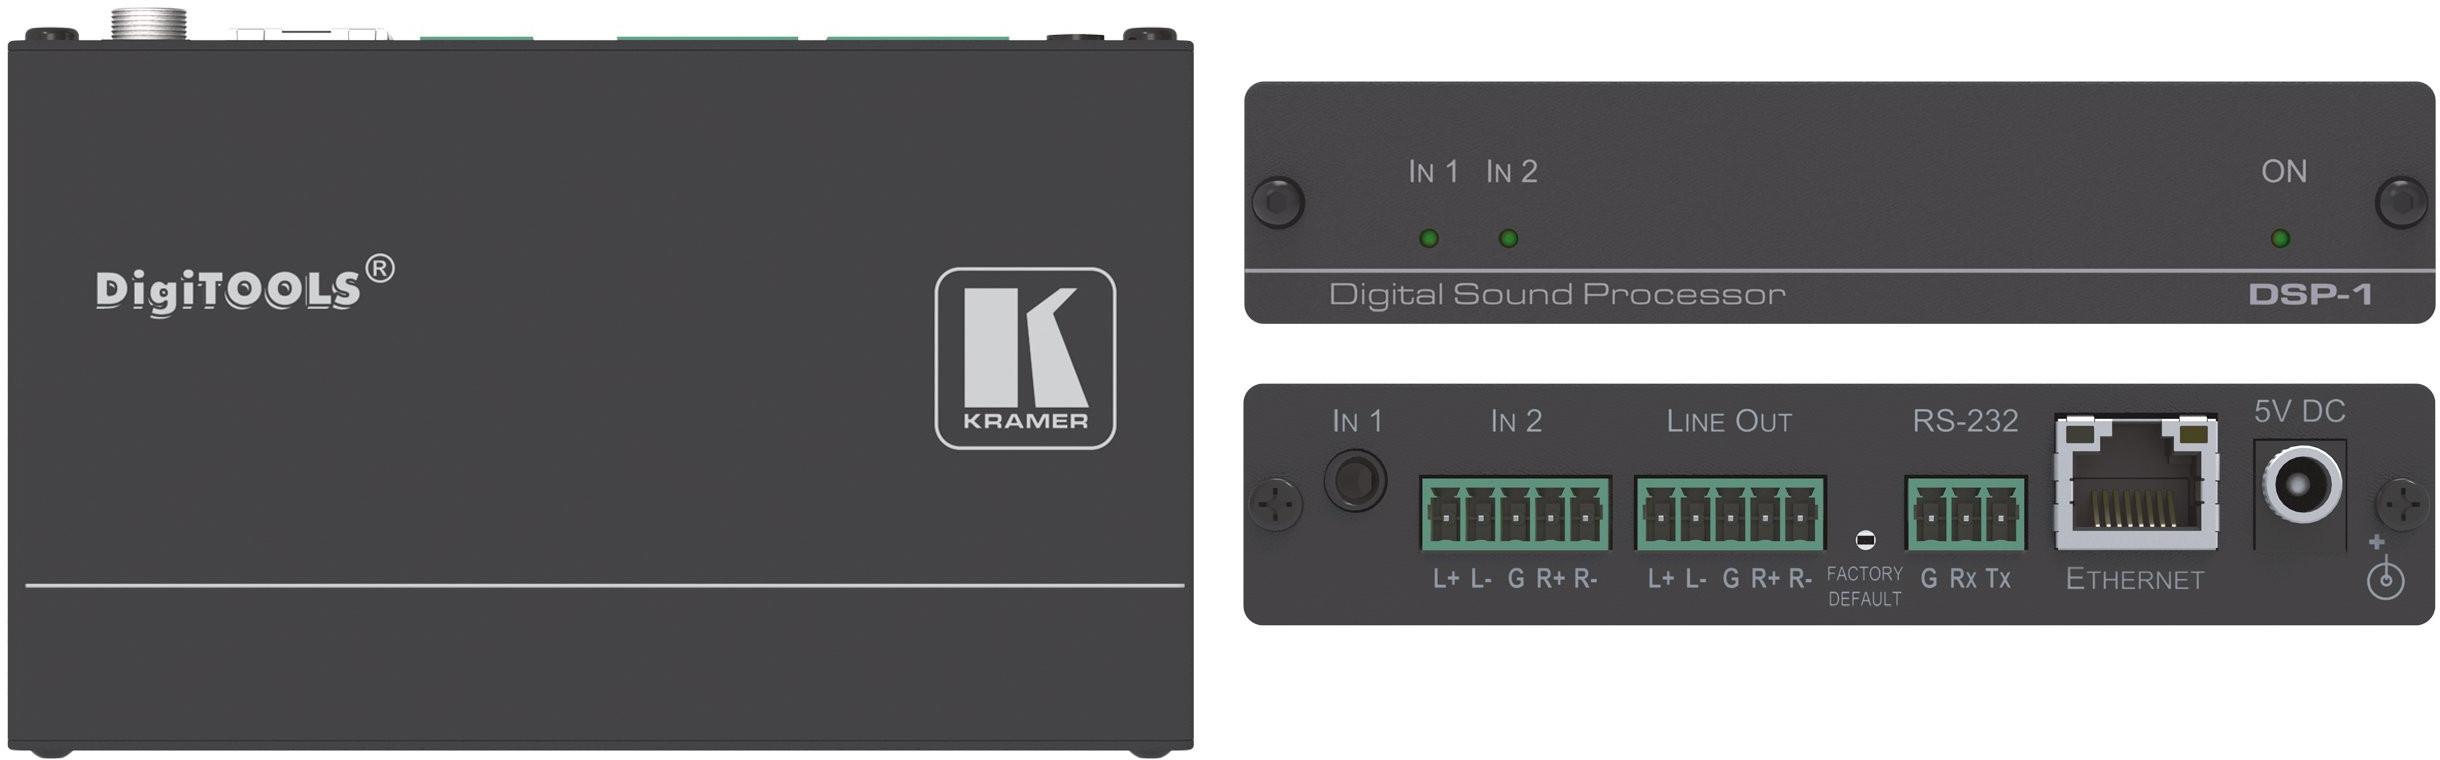 Kramer Electronics Mini Digital Sound Processor